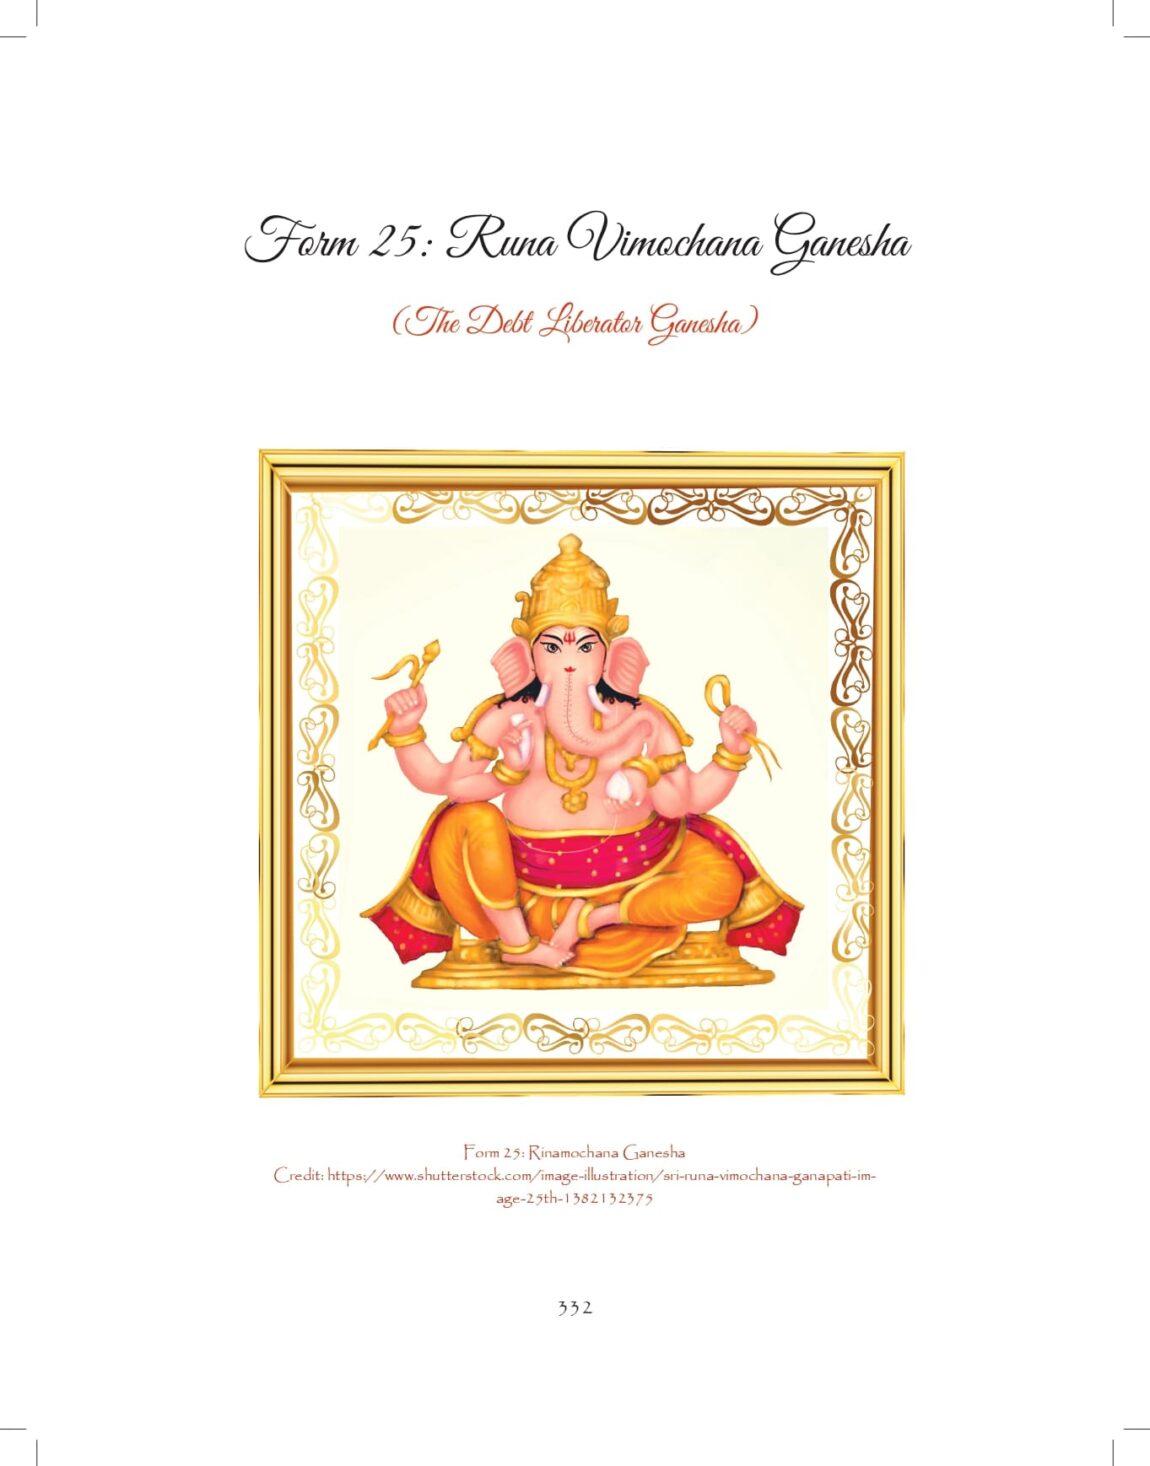 Ganesh-print_pages-to-jpg-0332.jpg